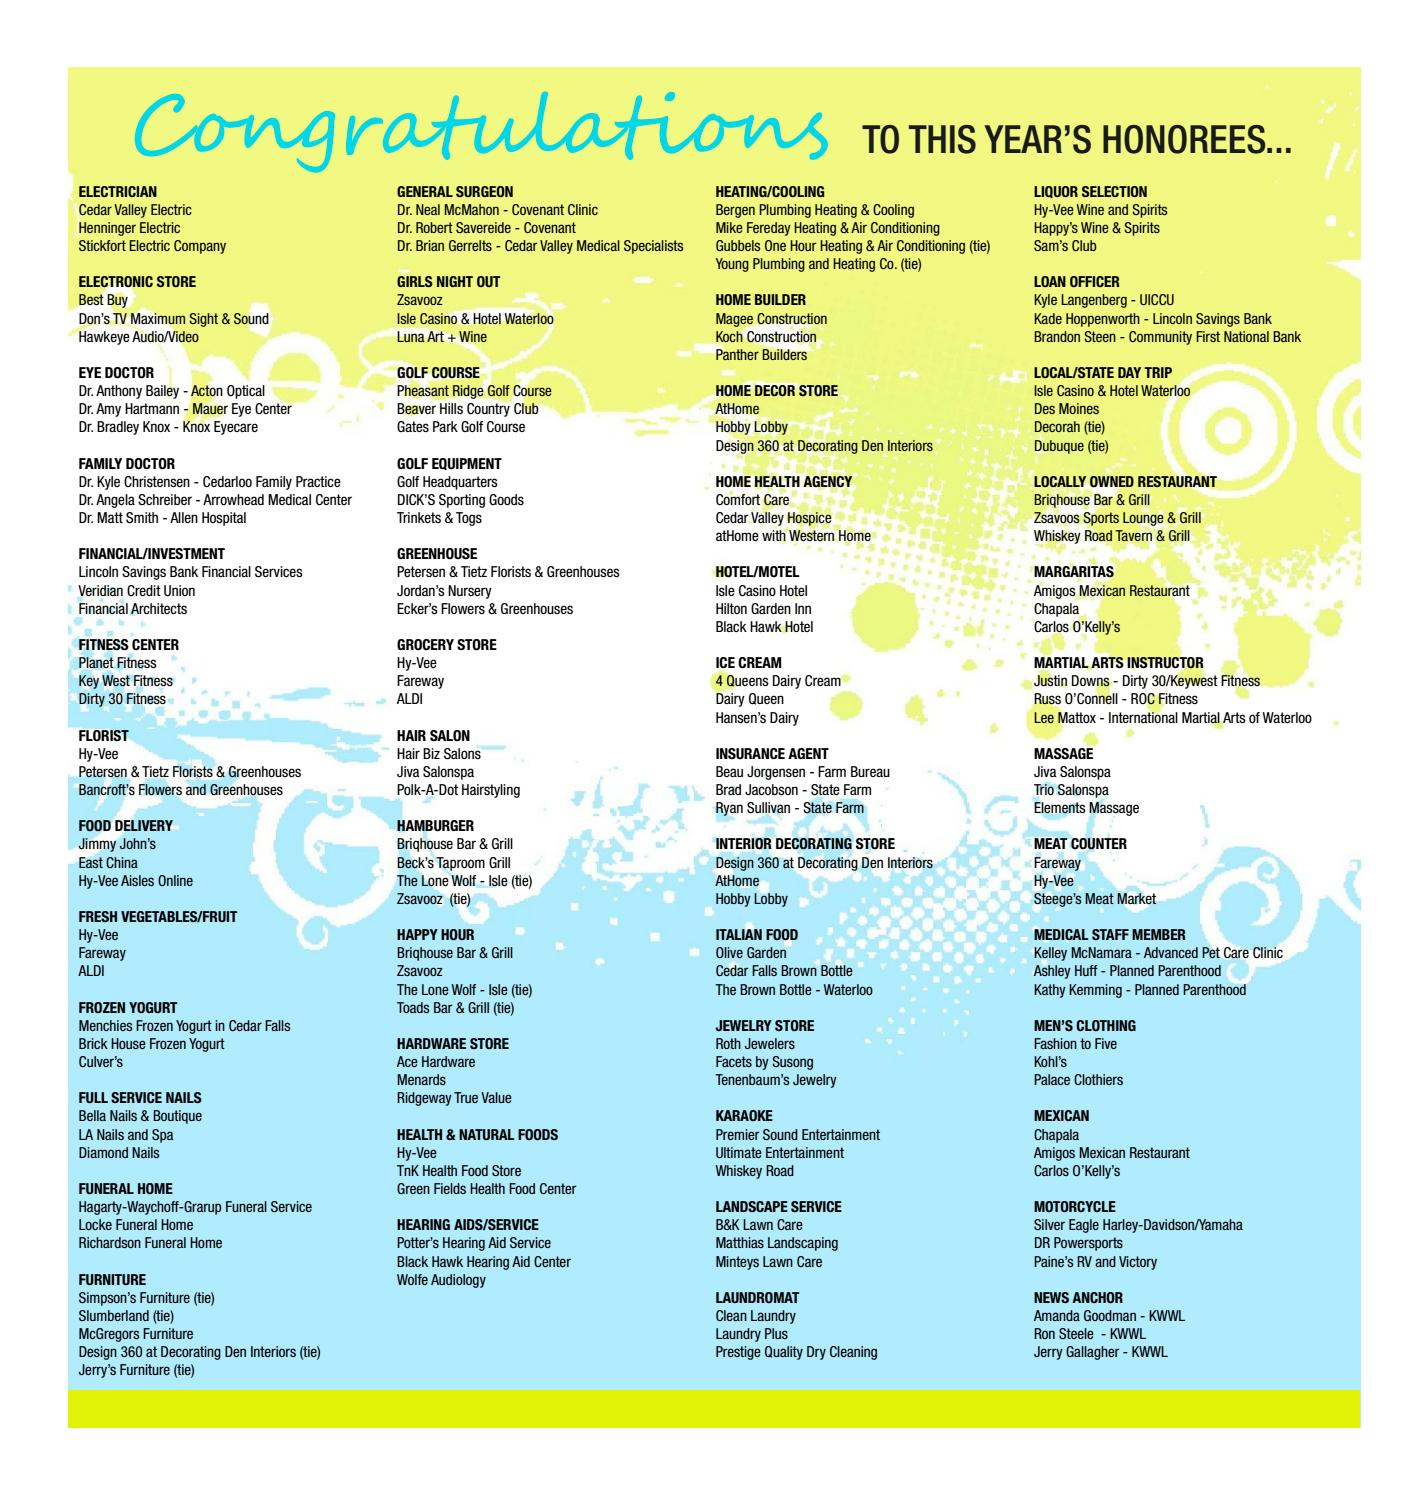 Best Of The Best 2016 by Waterloo-Cedar Falls Courier - issuu